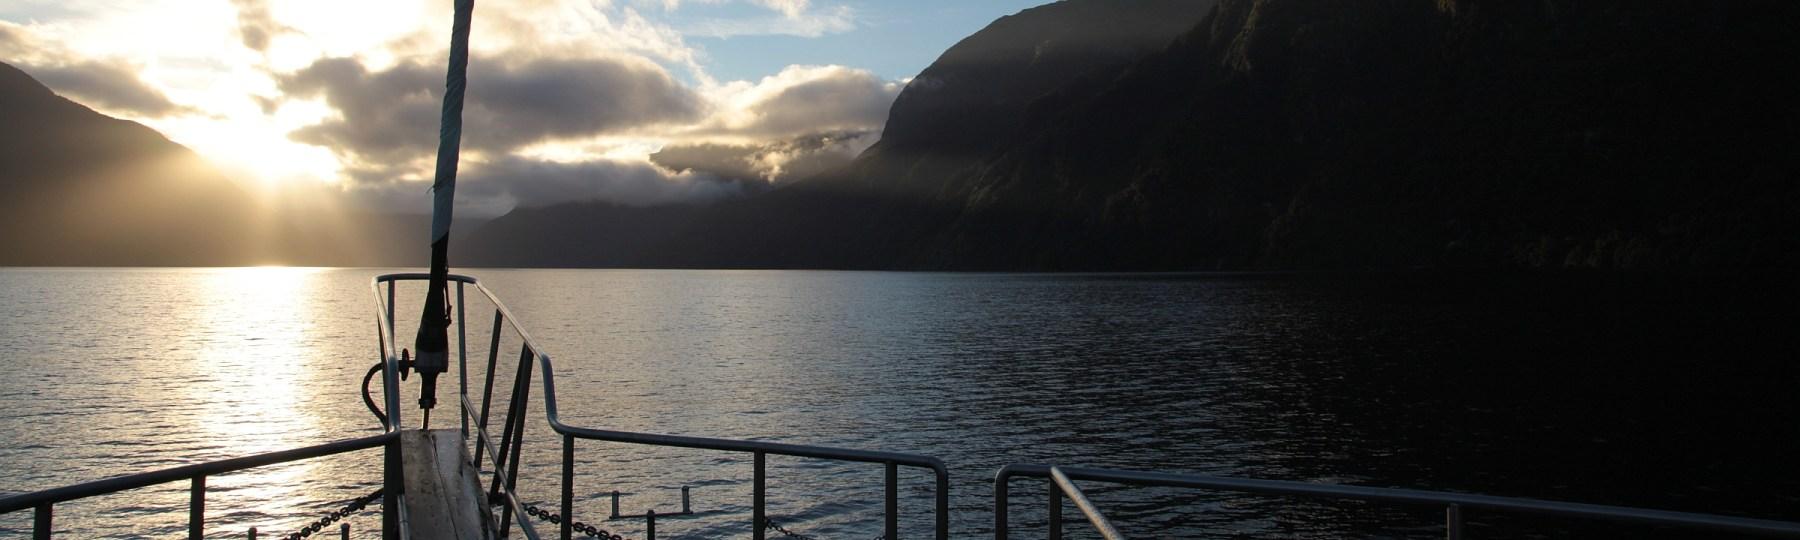 Sonnenaufgang am Doubtful Sound, Fjordland, Neuseeland